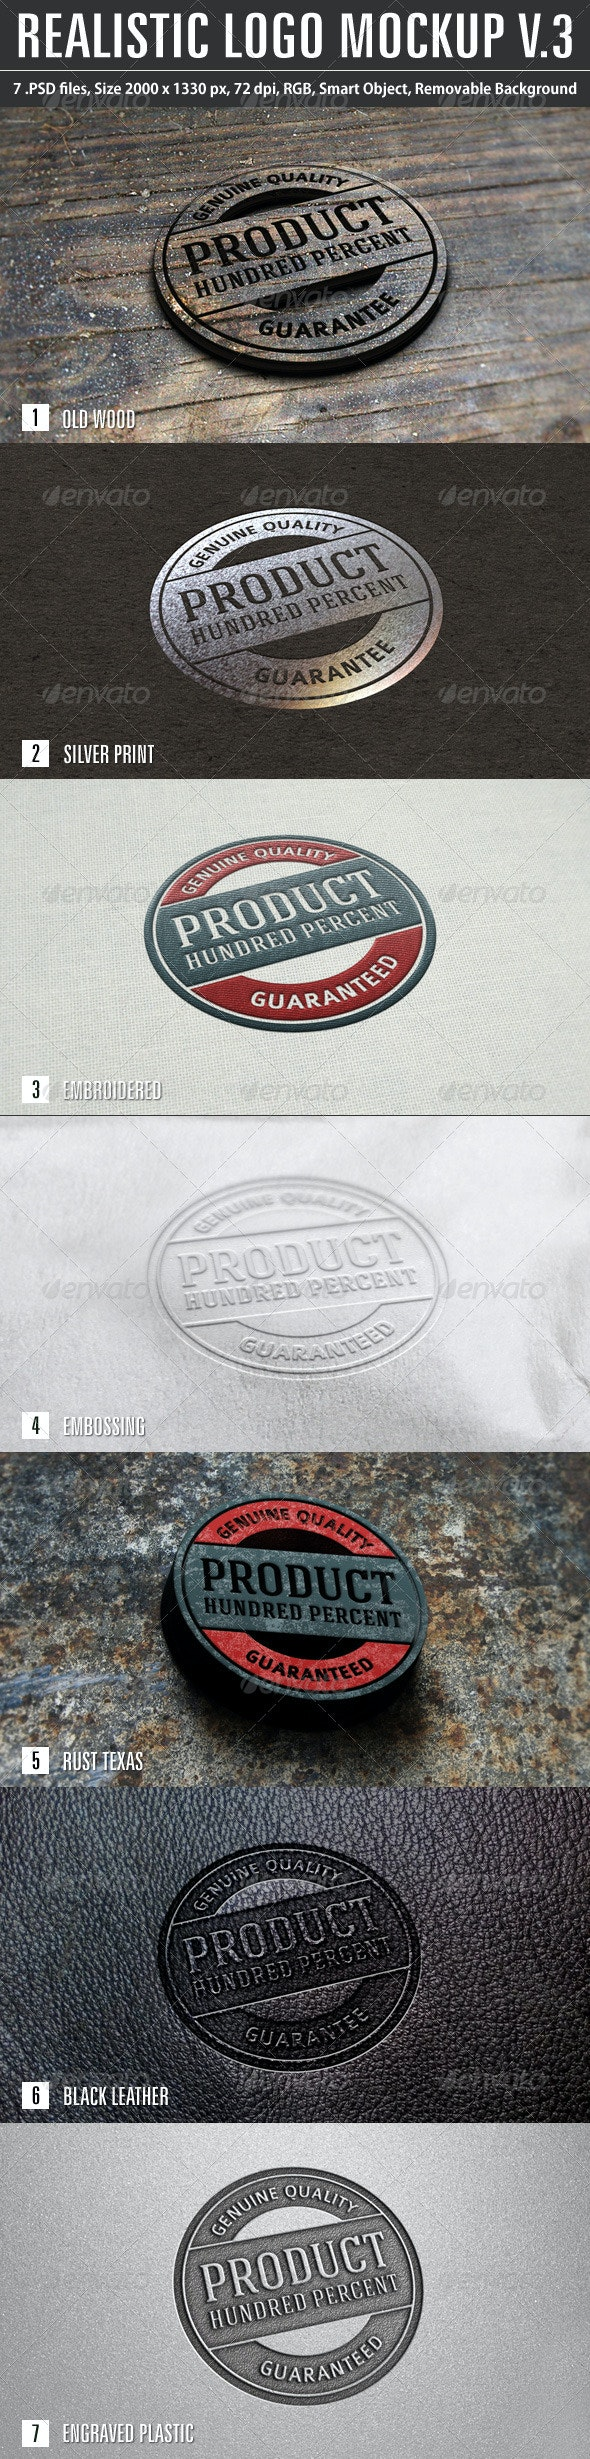 Realistic Logo Mockup v.3 - Logo Product Mock-Ups